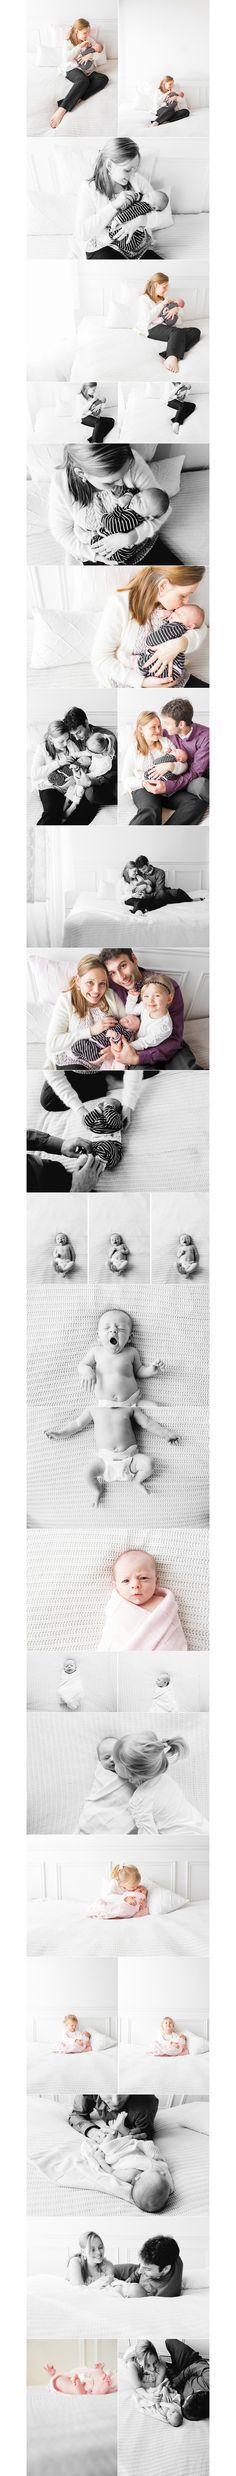 COLIBRIPHOTO|Lifestyle Photography Inspiration